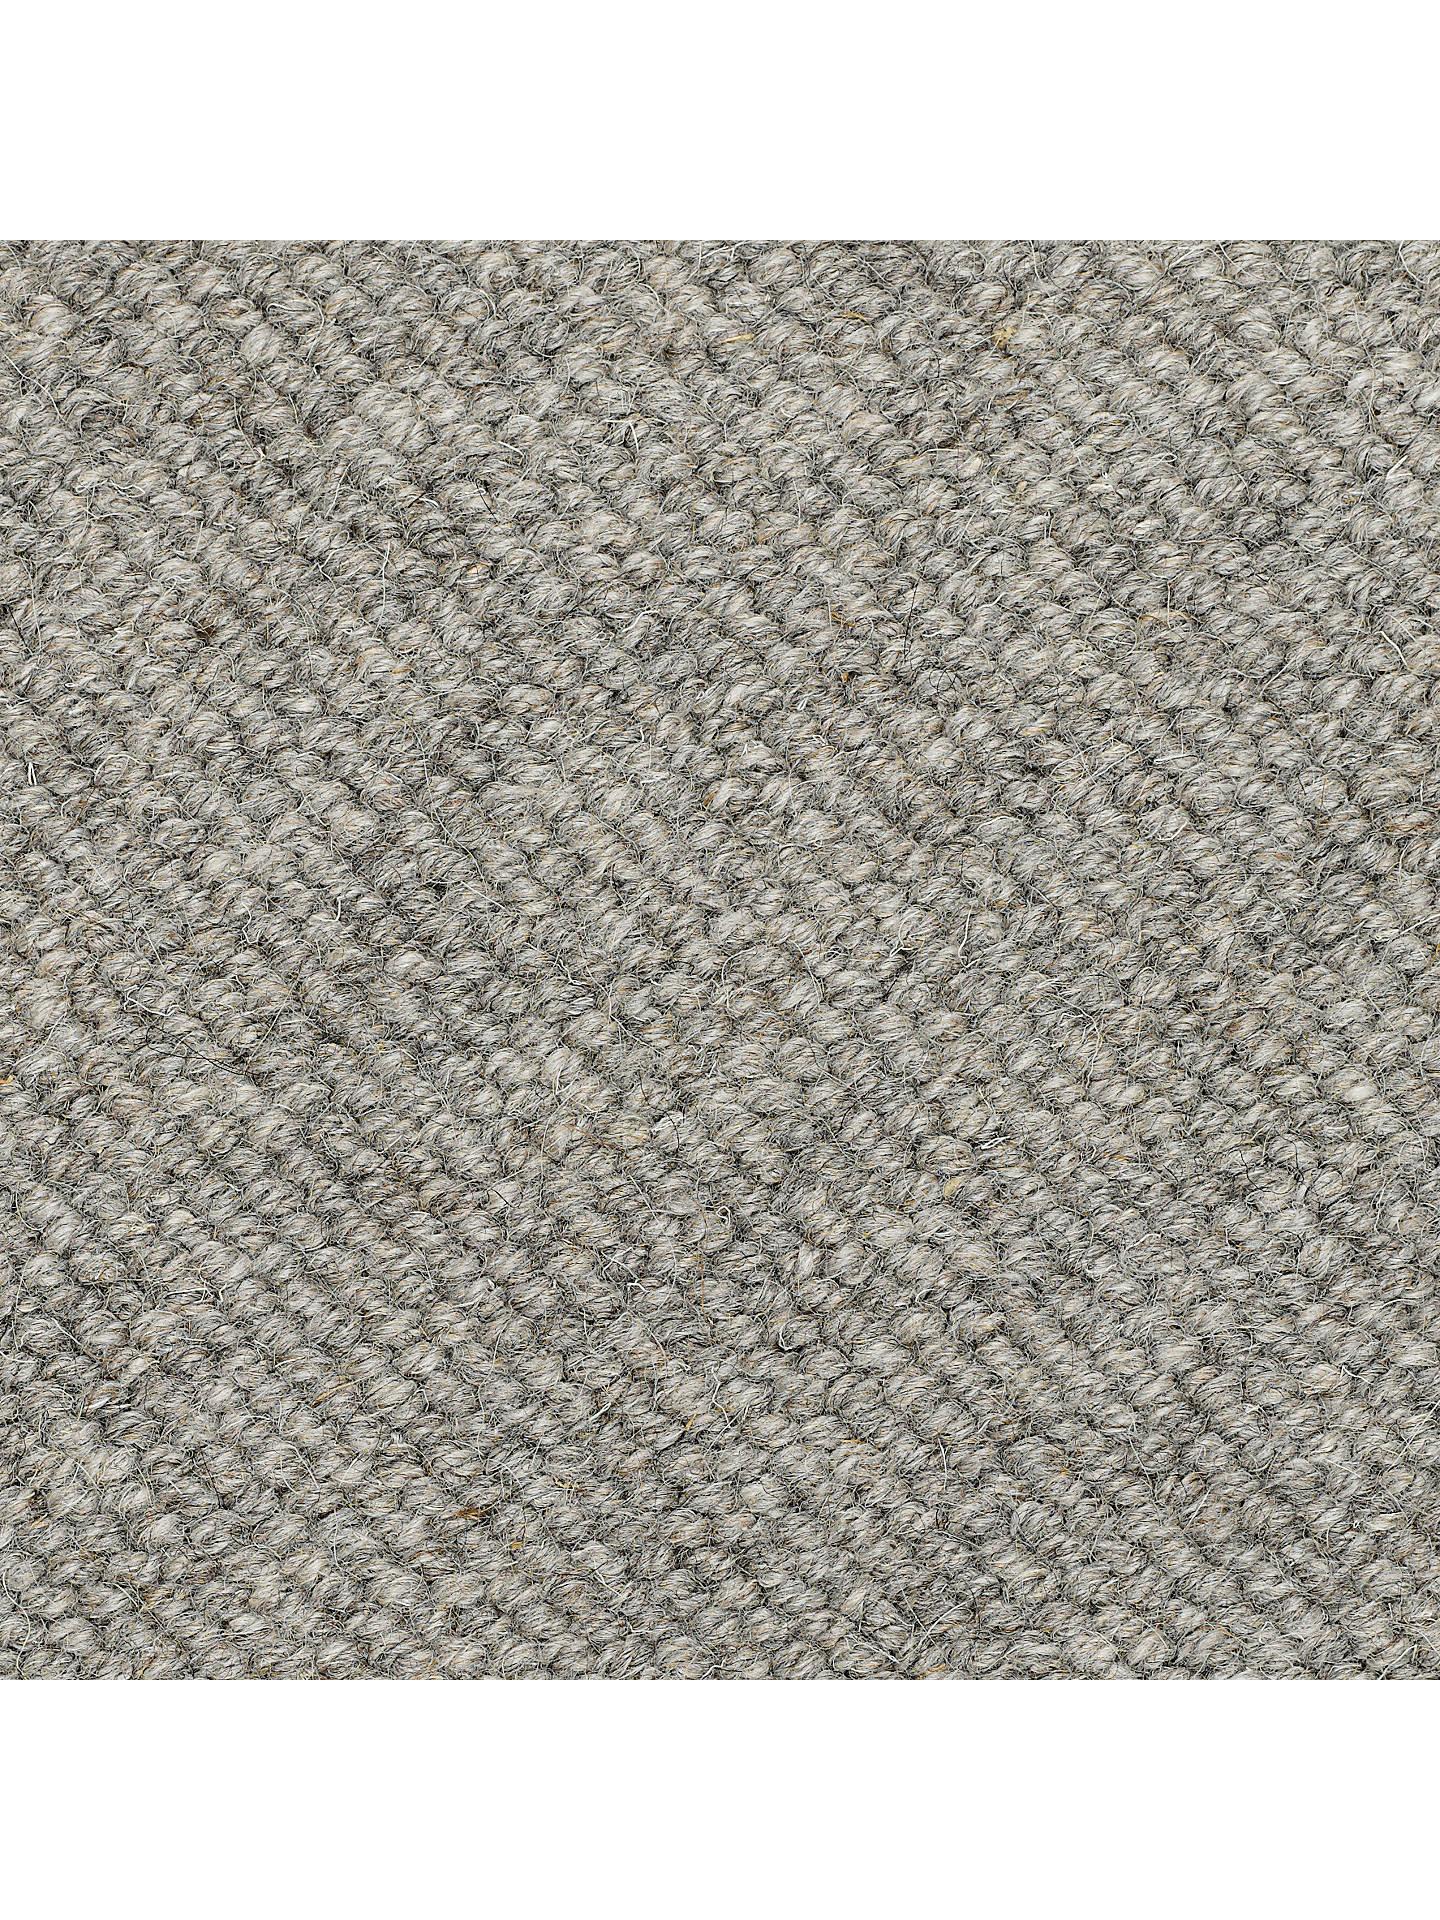 John Lewis Amp Partners Rustic Cable 4 Ply Wool Loop Carpet